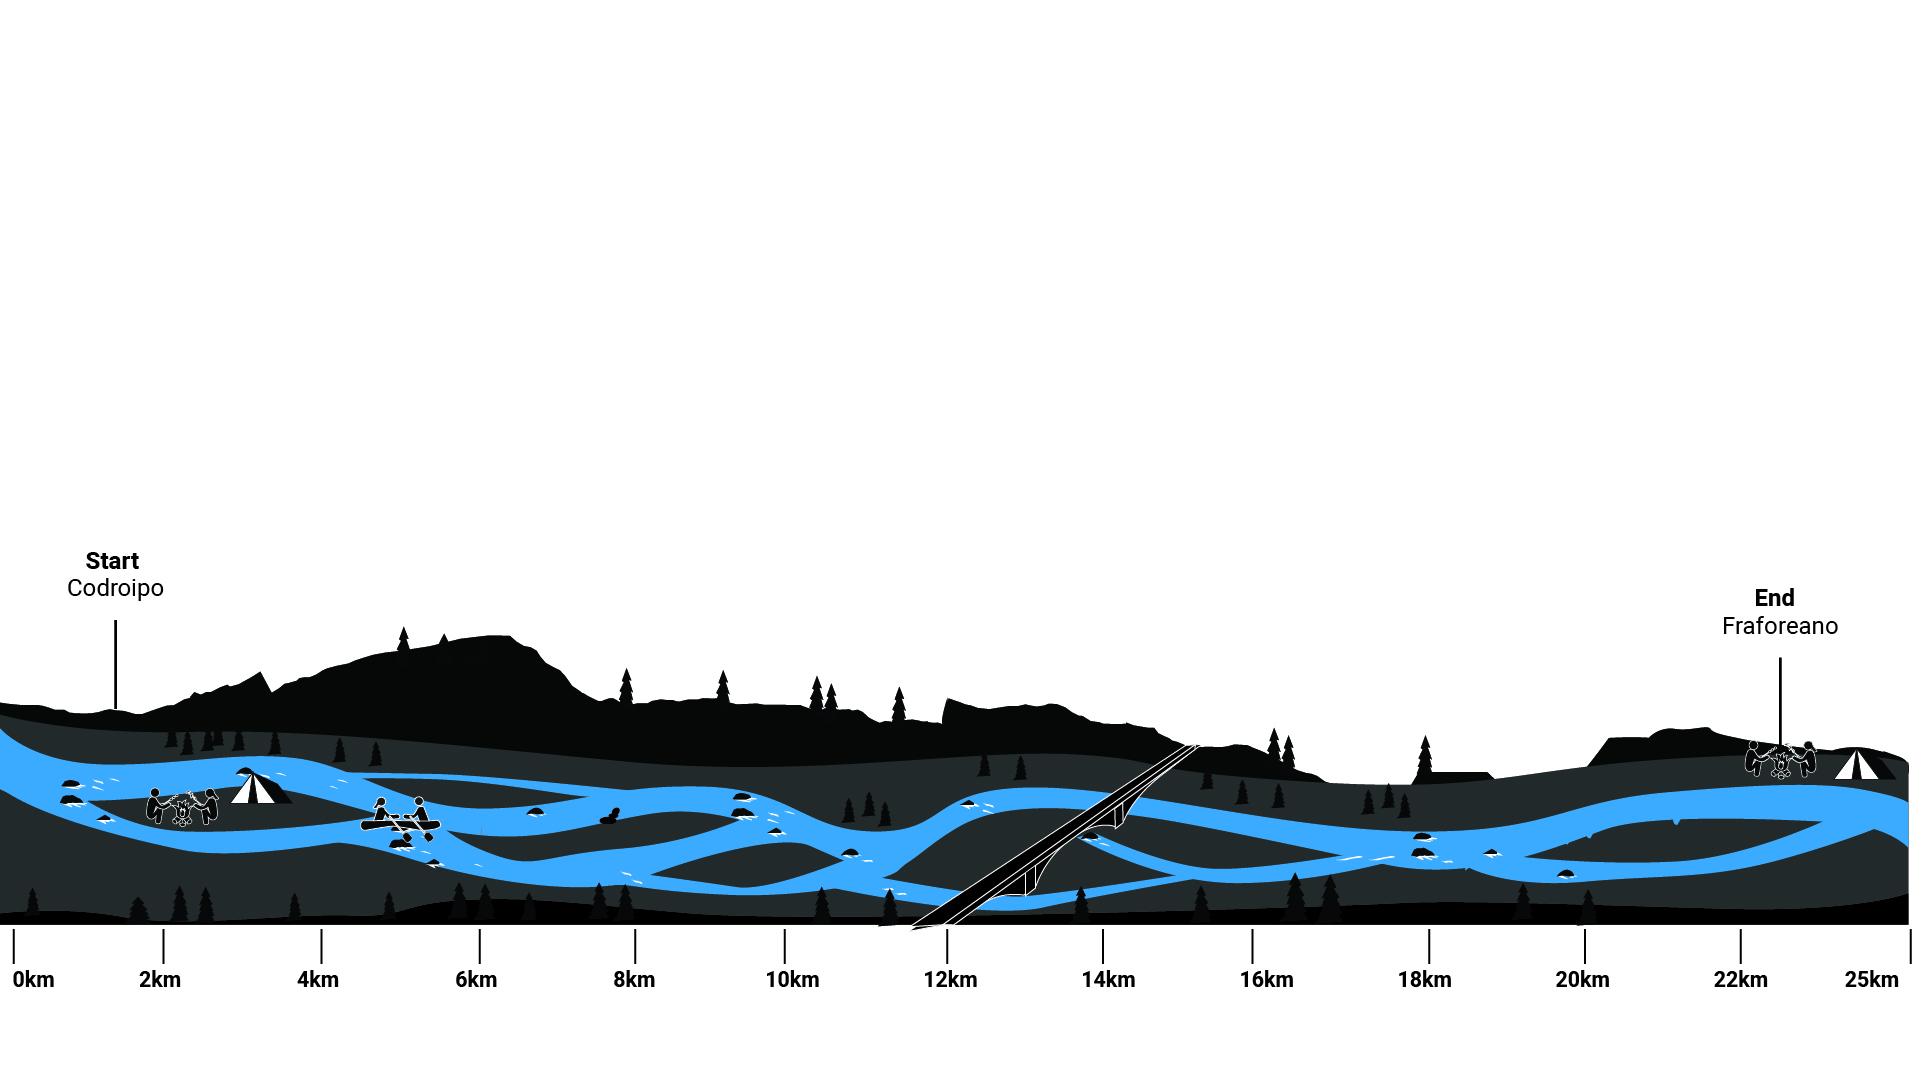 Flusskilometer Tagliamento